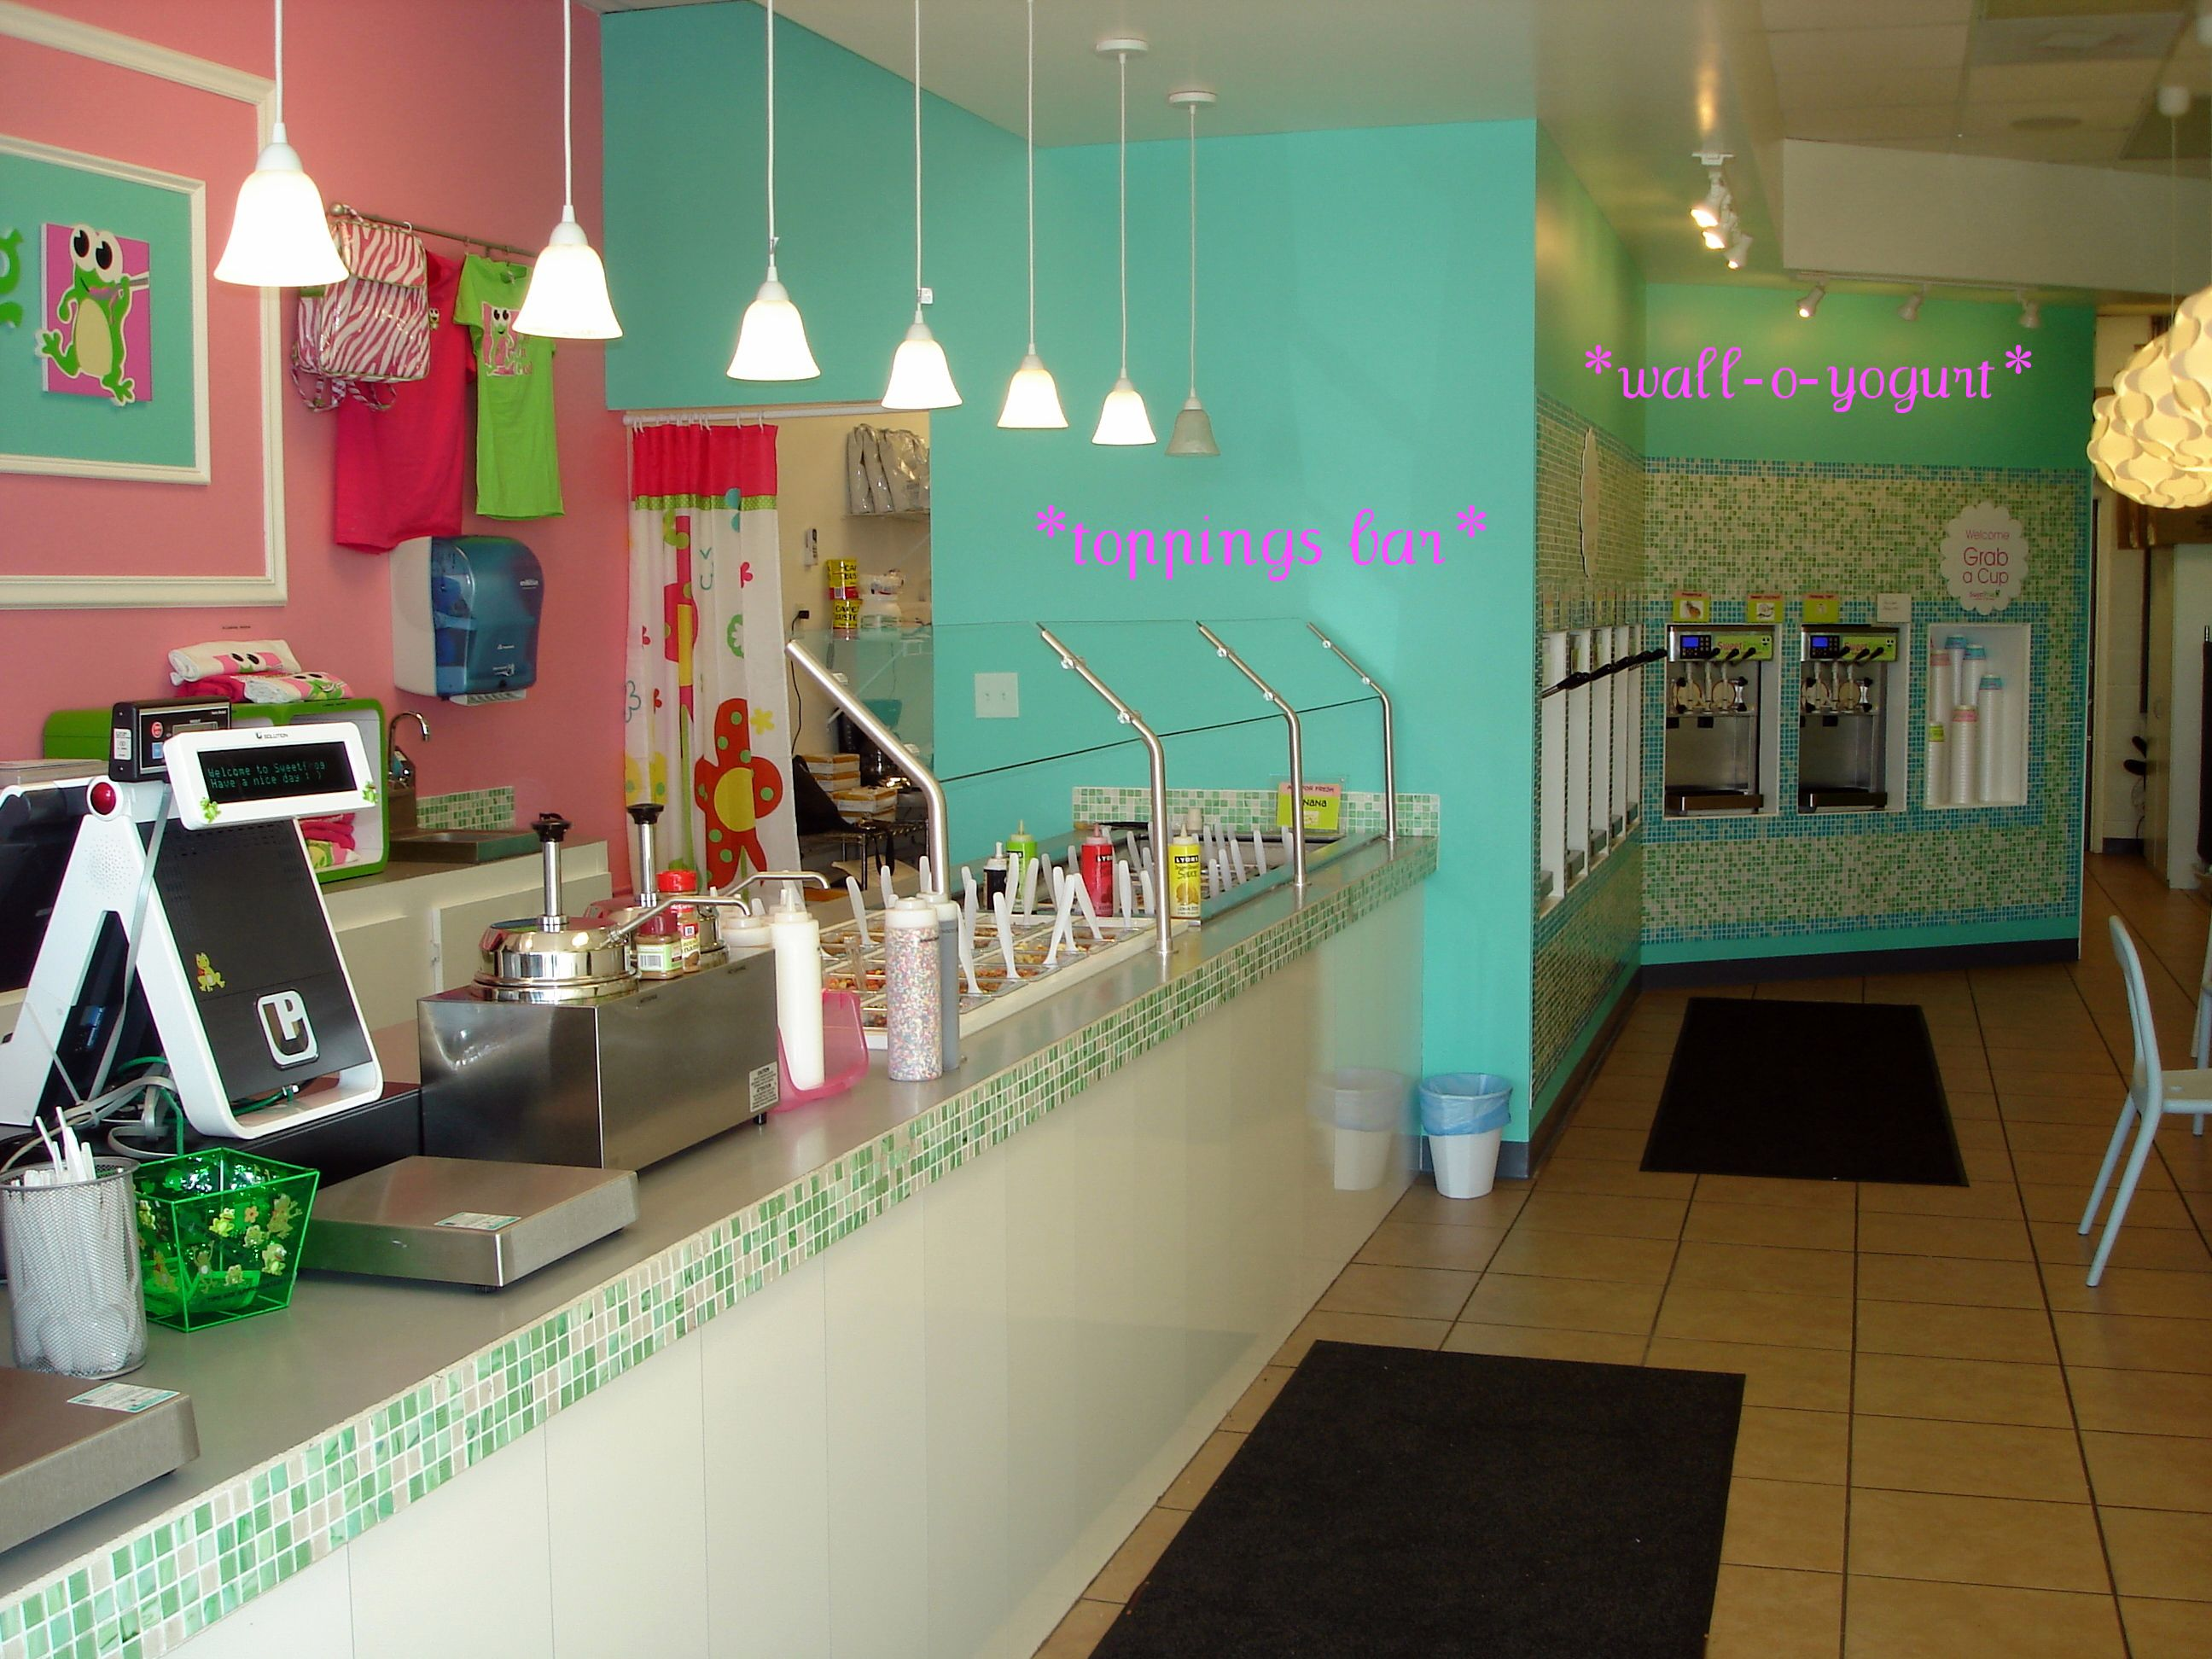 A Nice Looking Interior Design For An Ice Cream Shop Parlor Decor